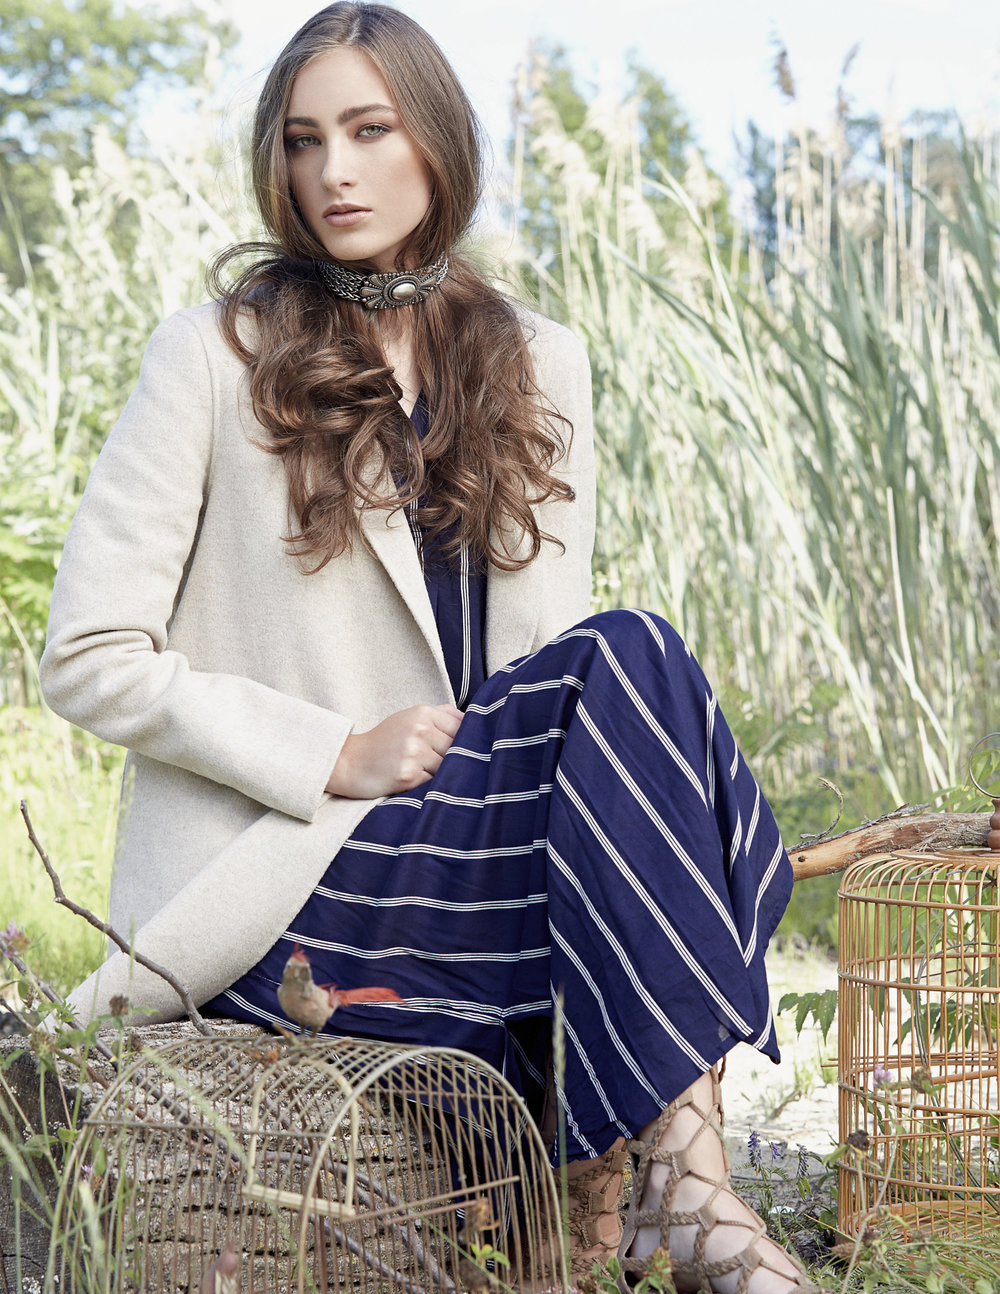 3Emilie_Tournevache_Boheme_Fashion_Editorial_Photographer.jpg